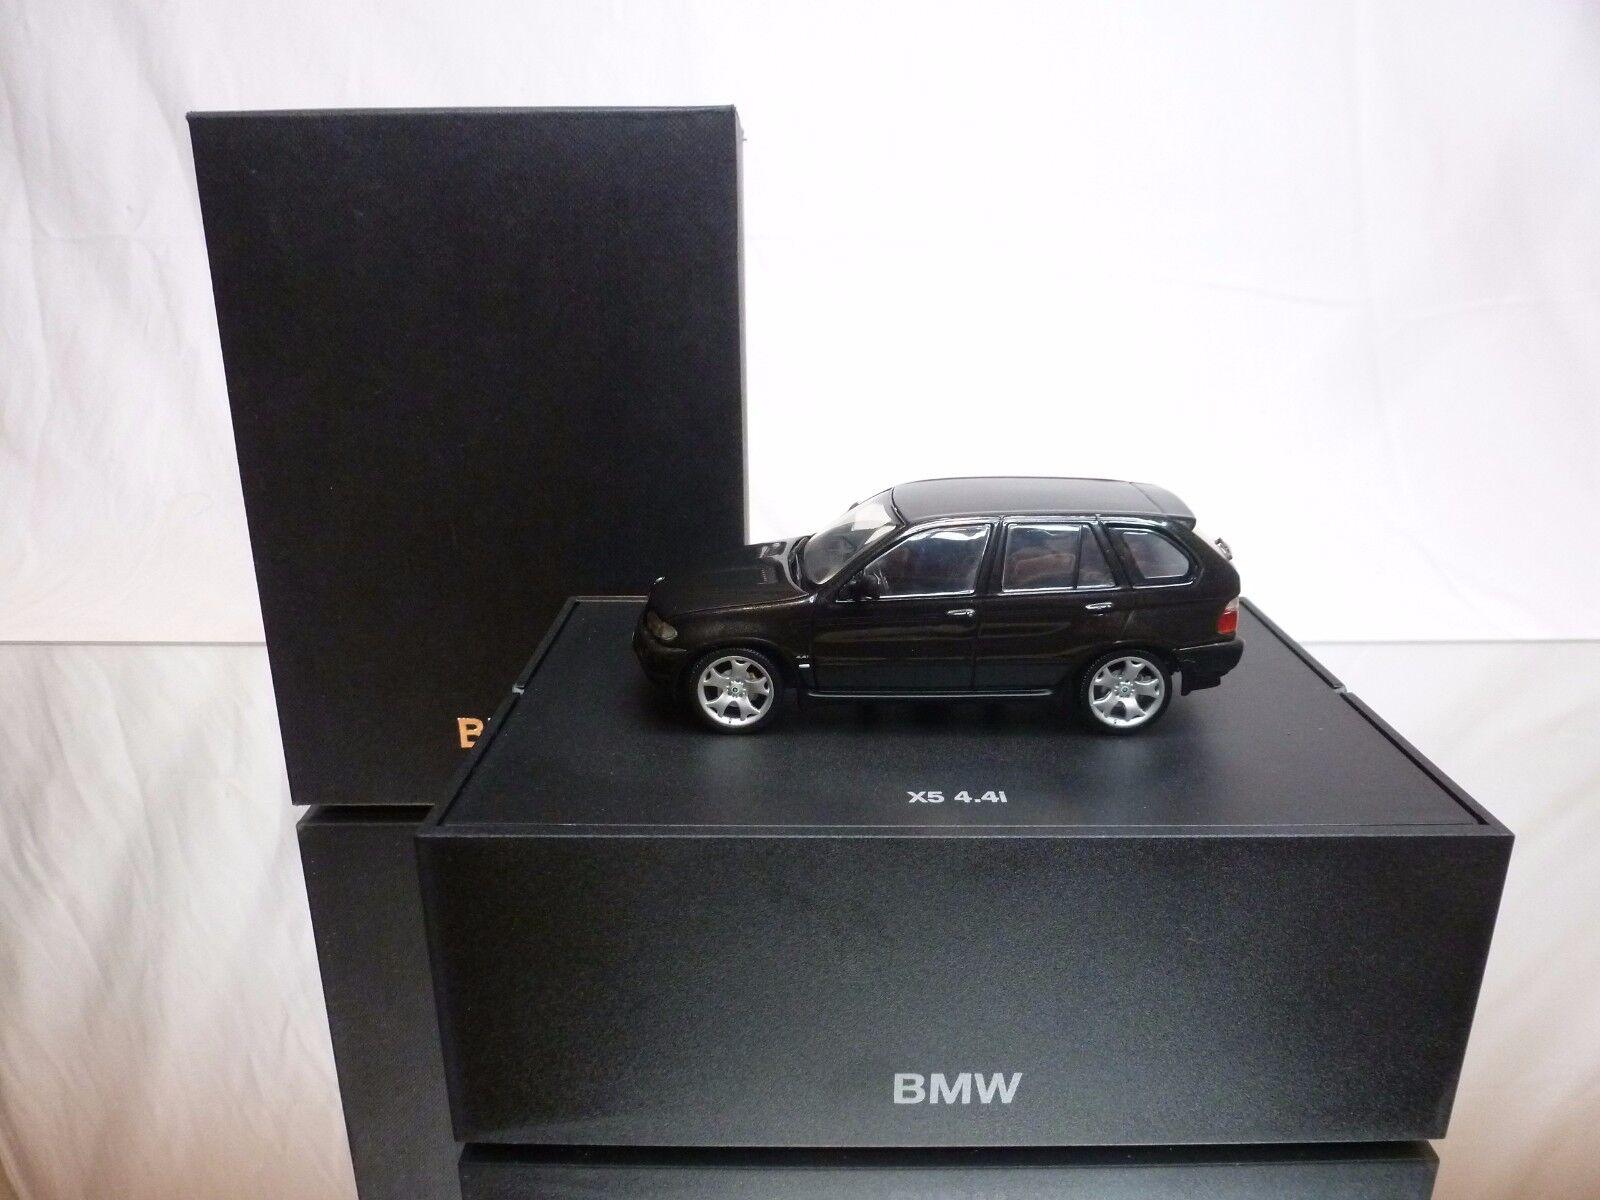 MINICHAMPS BMW 4.4i  - METALLIC 1 43 - EXCELLENT CONDITION IN DEALER BOX